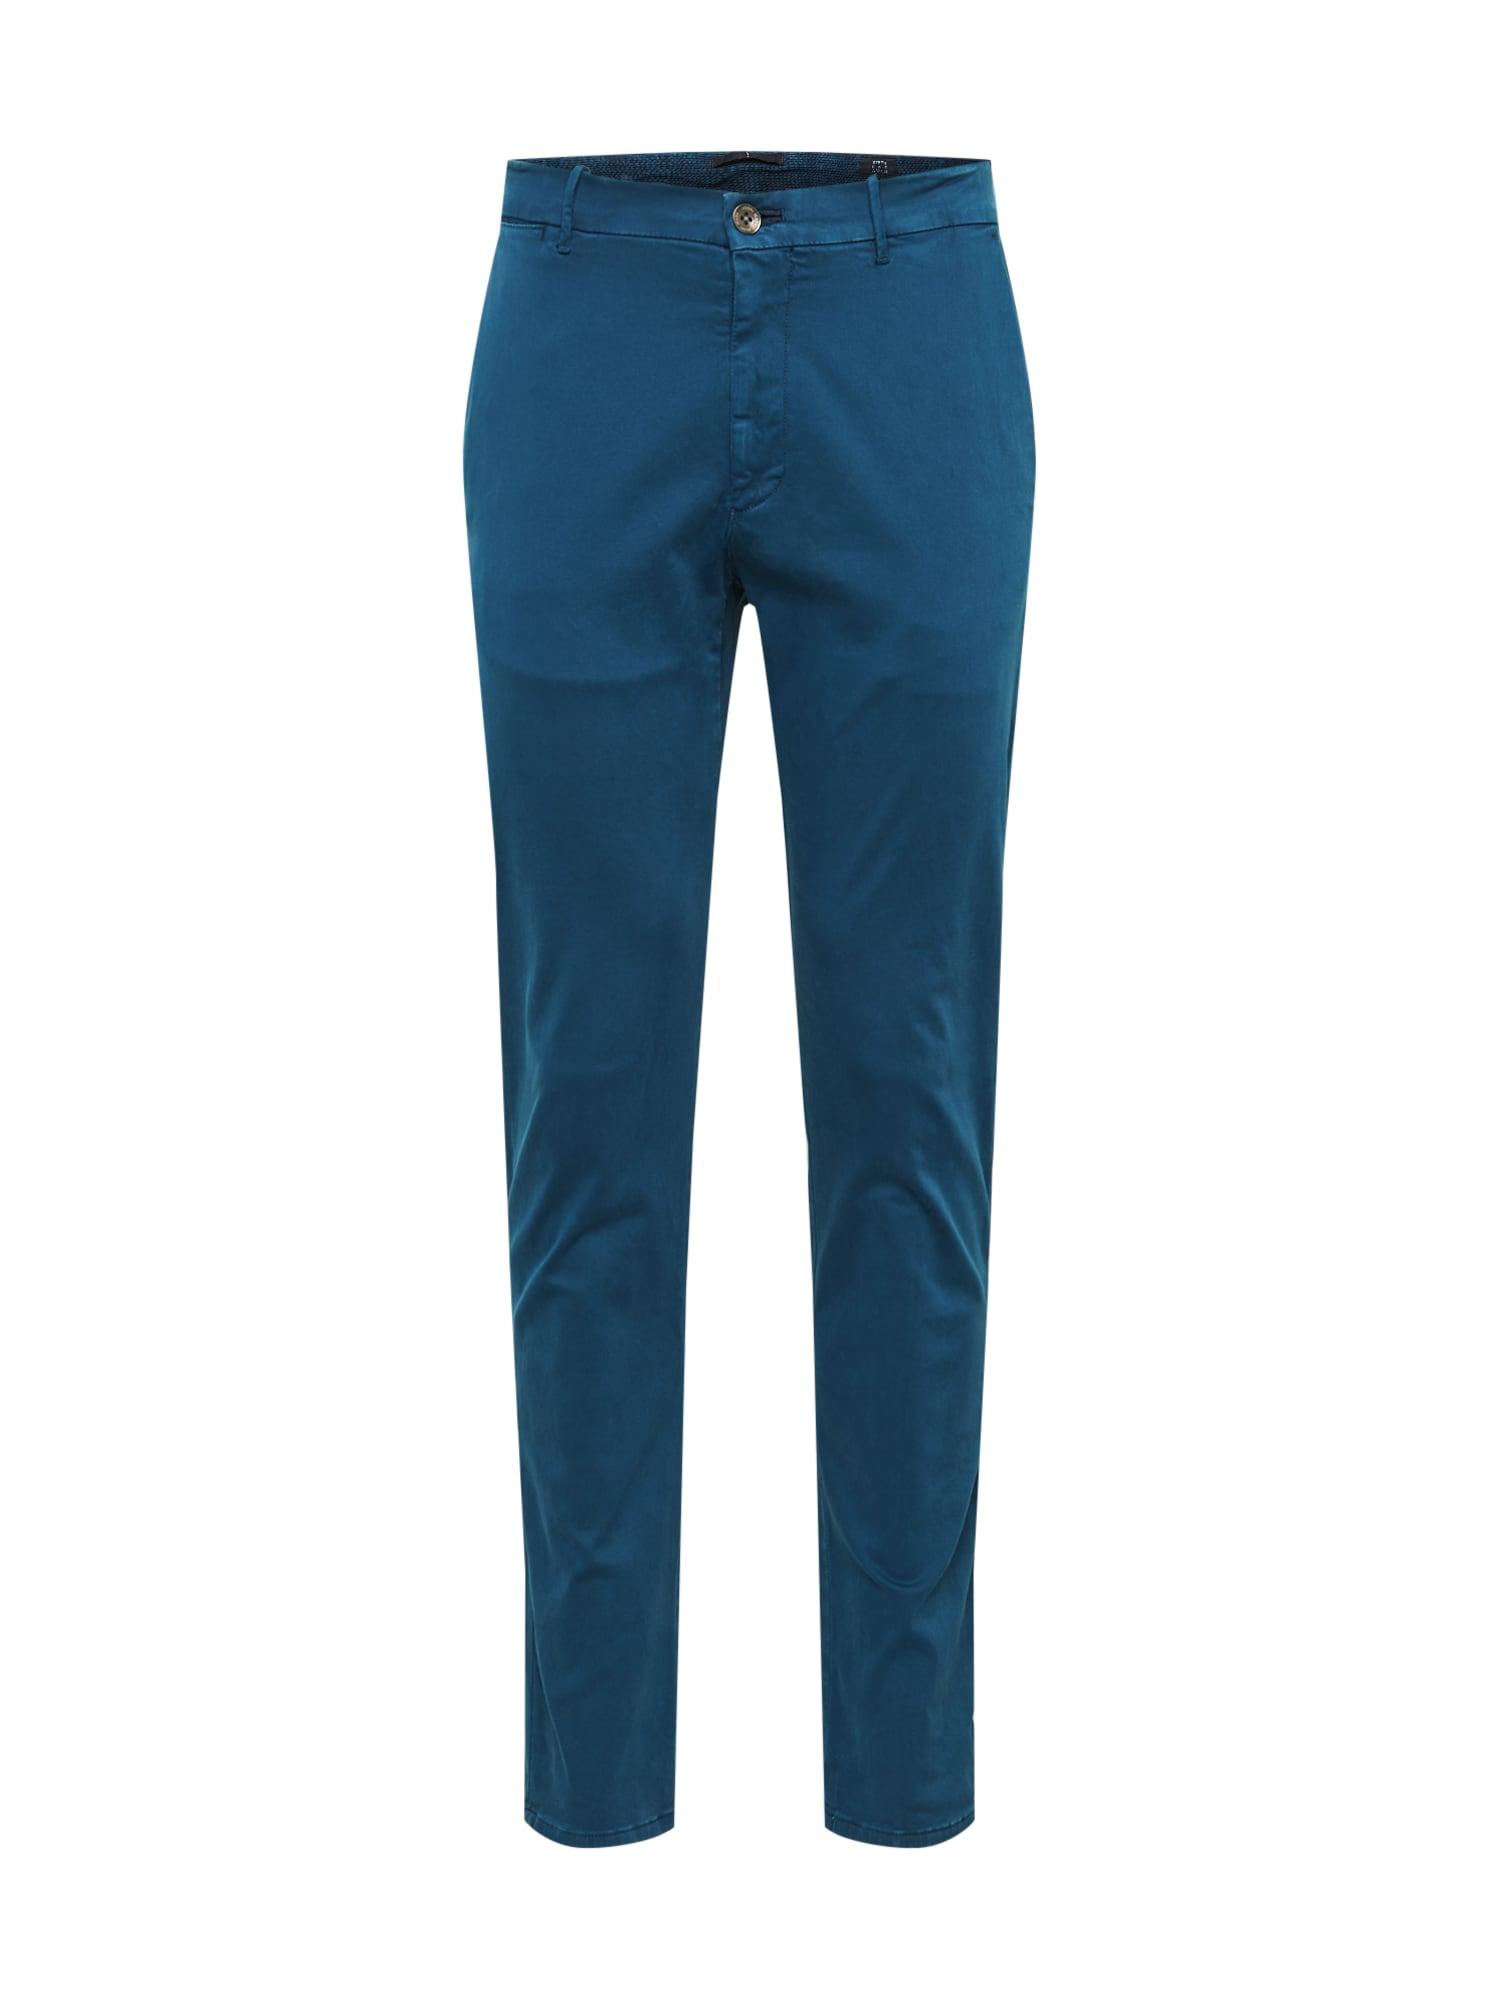 "JOOP! Jeans ""Chino"" stiliaus kelnės benzino spalva"